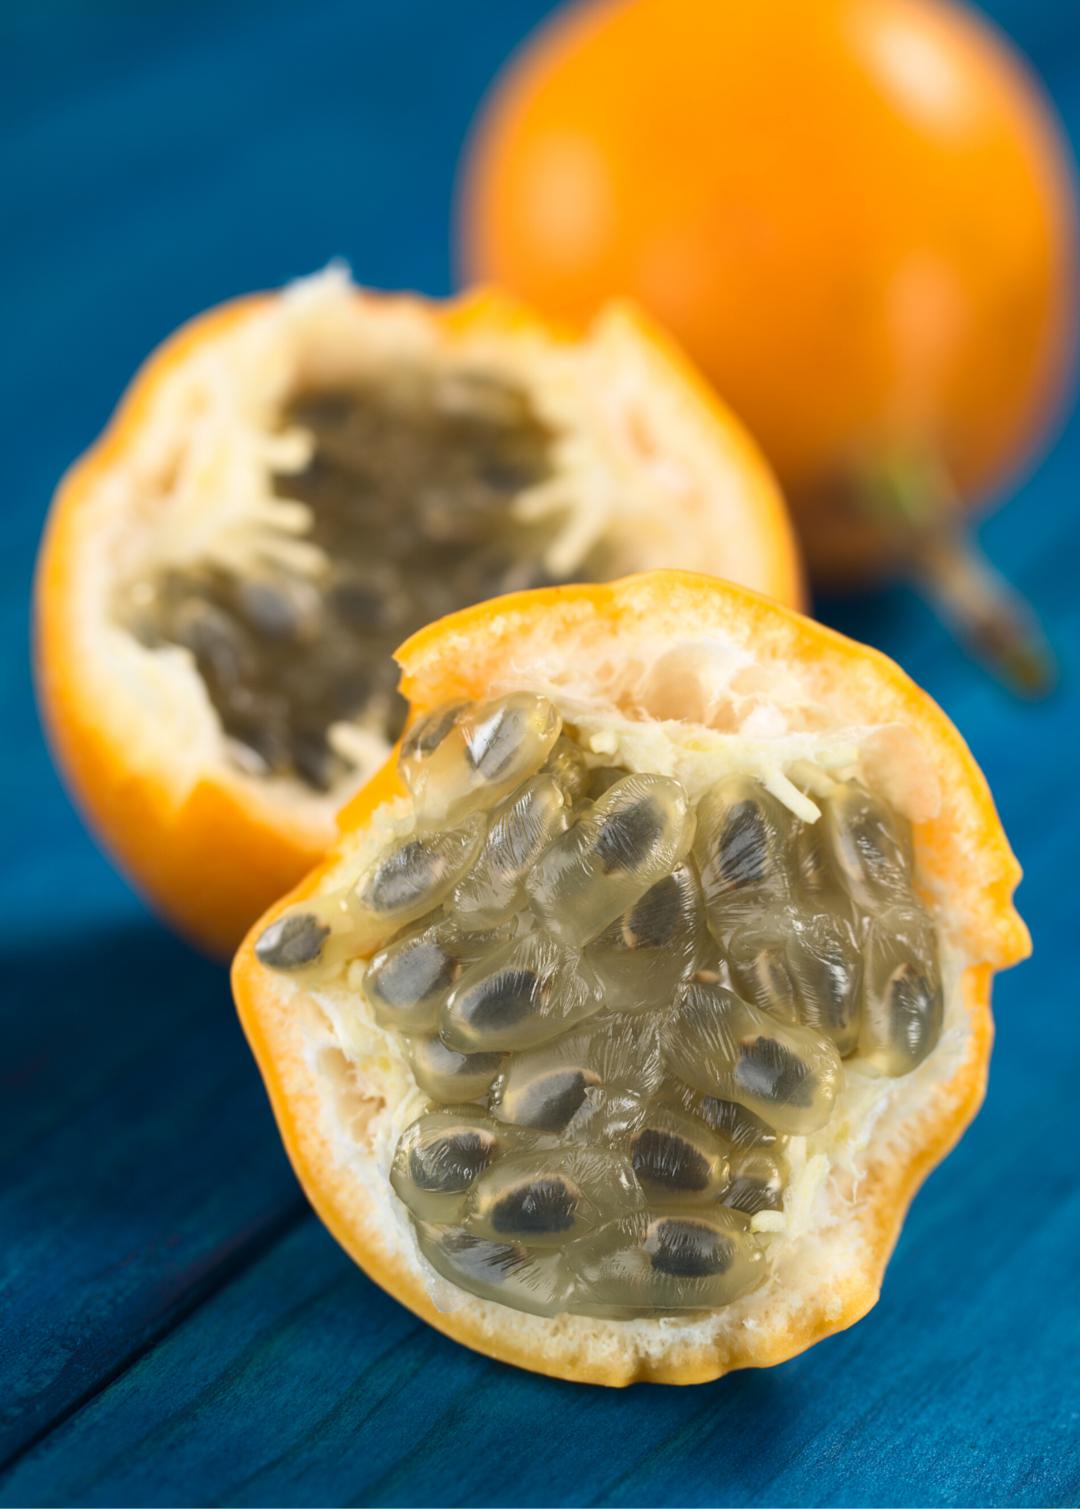 Passion Fruit Yellow Passiflora Ligularis Passion Fruit Plant Yellow Passion Fruit Passiflora